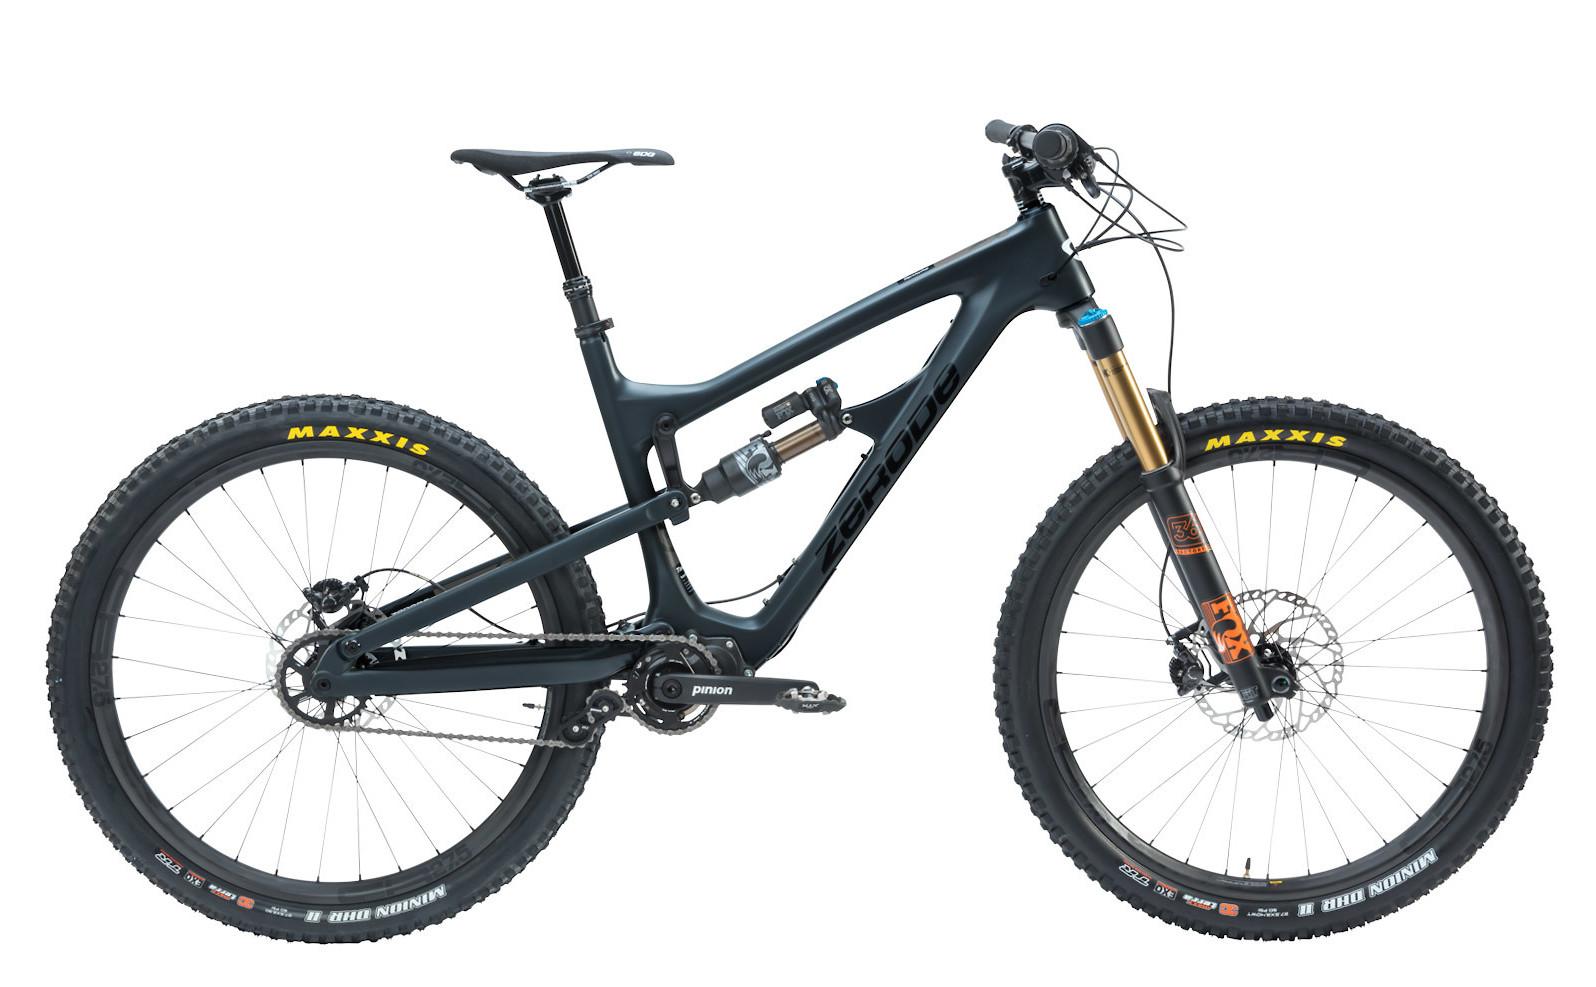 2019 Zerode Taniwha Bike (Signature build shown in photos)